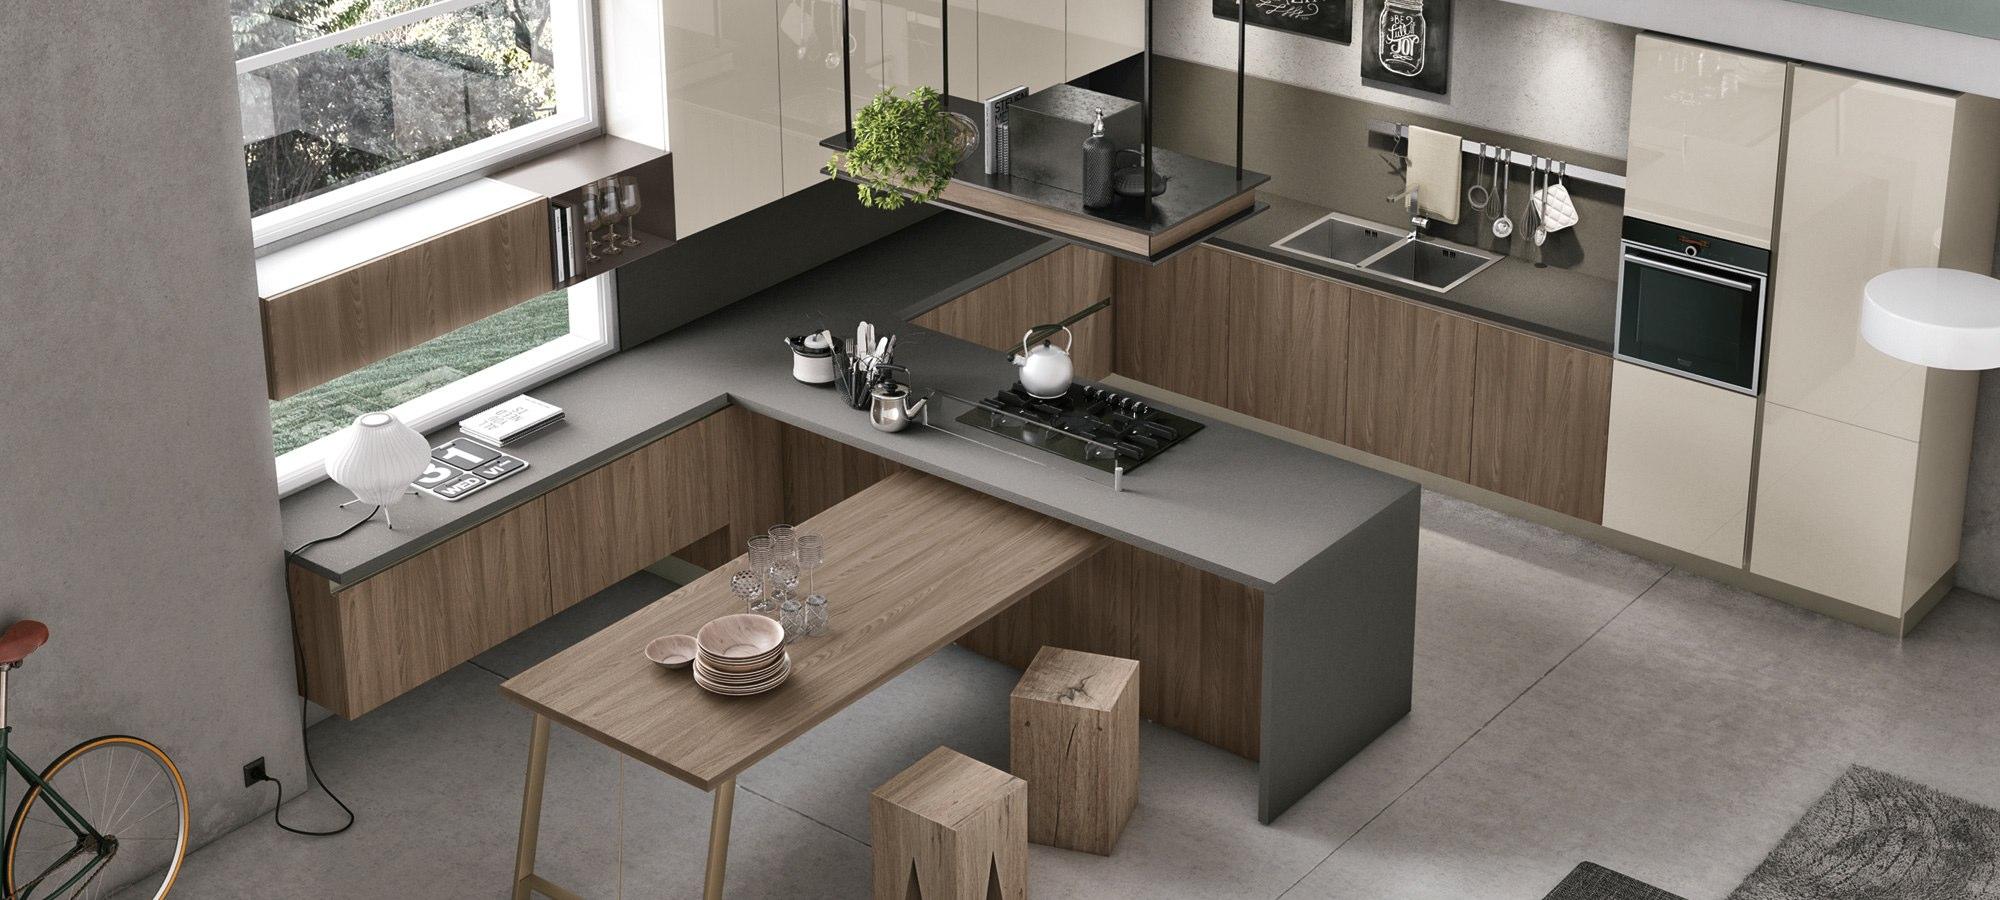 Tips For The Ultimate Kitchen Make Over Kitchen Cabinets. Bathroom  Vanities. Remodeling U0026 Design Center. Italian Kitchen Cabinets